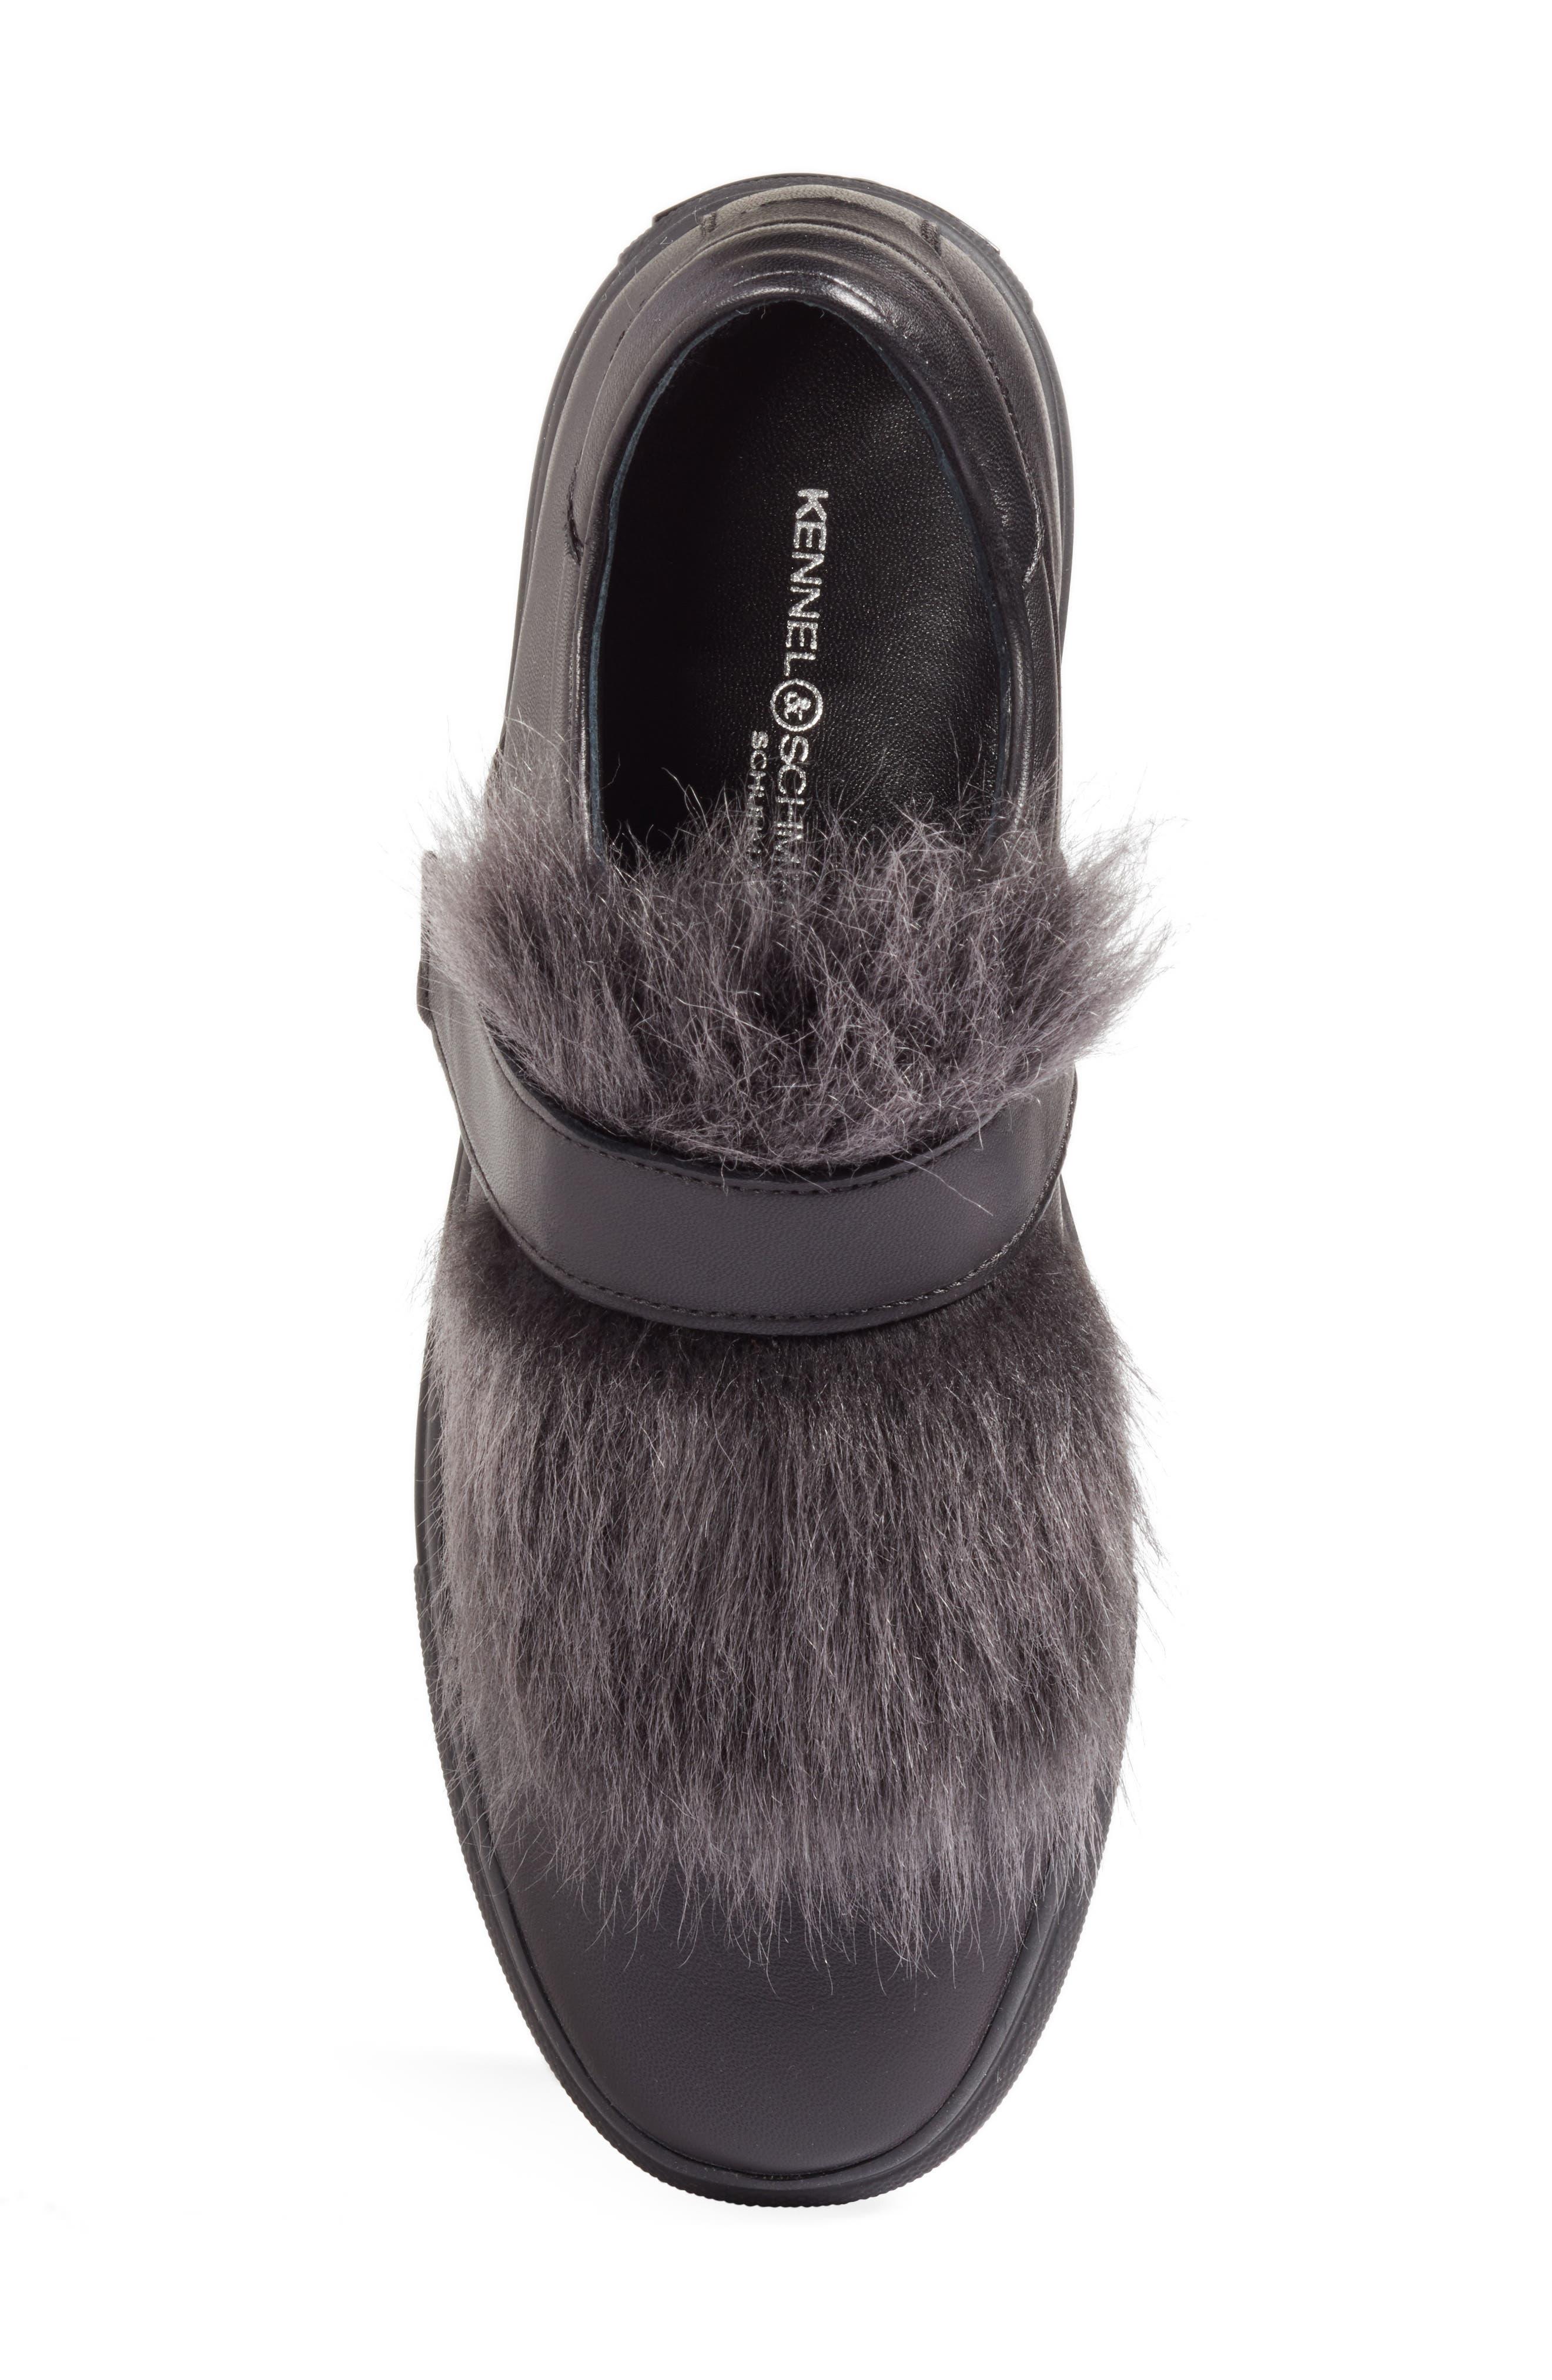 Kennel & Schmenger Basket Slip-On Sneaker with Genuine Shearling Trim,                             Alternate thumbnail 5, color,                             001